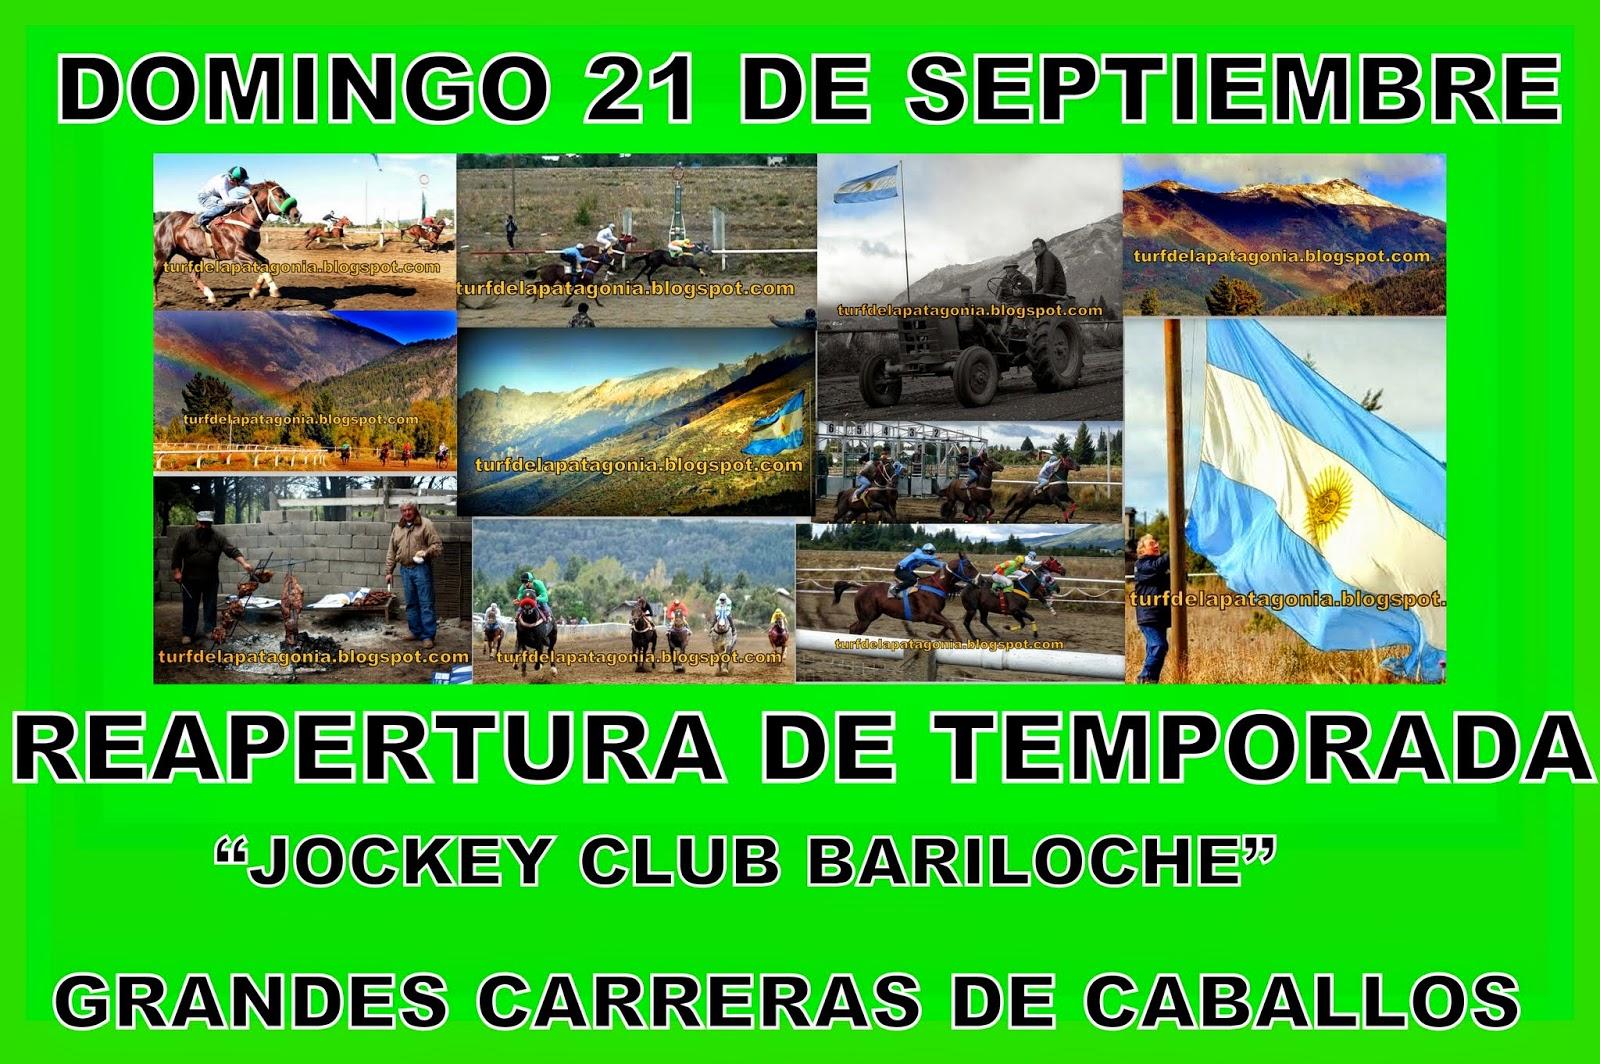 http://turfdelapatagonia.blogspot.com.ar/2014/09/2109-programa-de-carreras-de-caballos_6.html